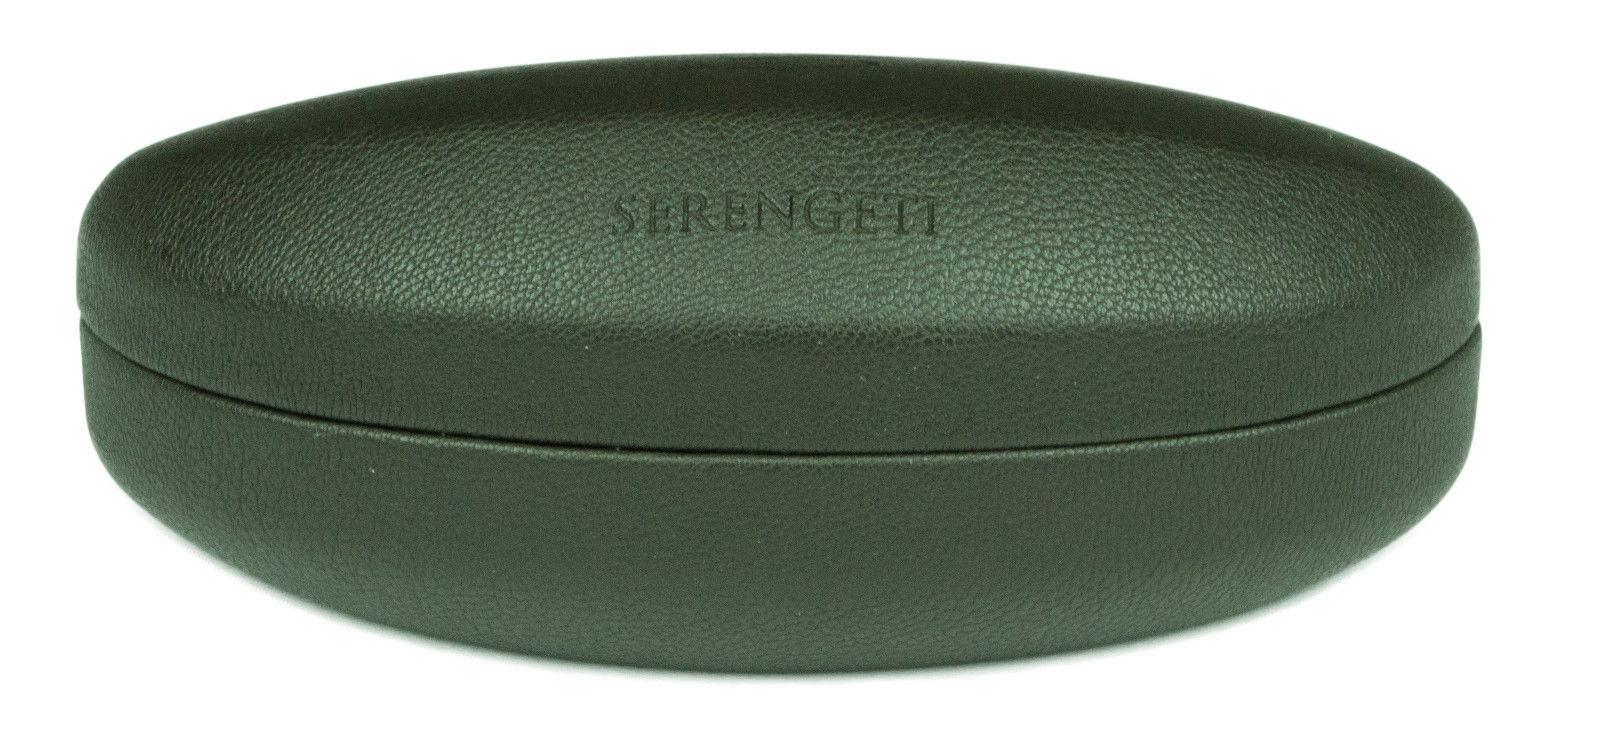 e39040e379f Serengeti Aerial Sunglasses - 7979 - Shiny Hematite w  Polarized Drivers  Lens